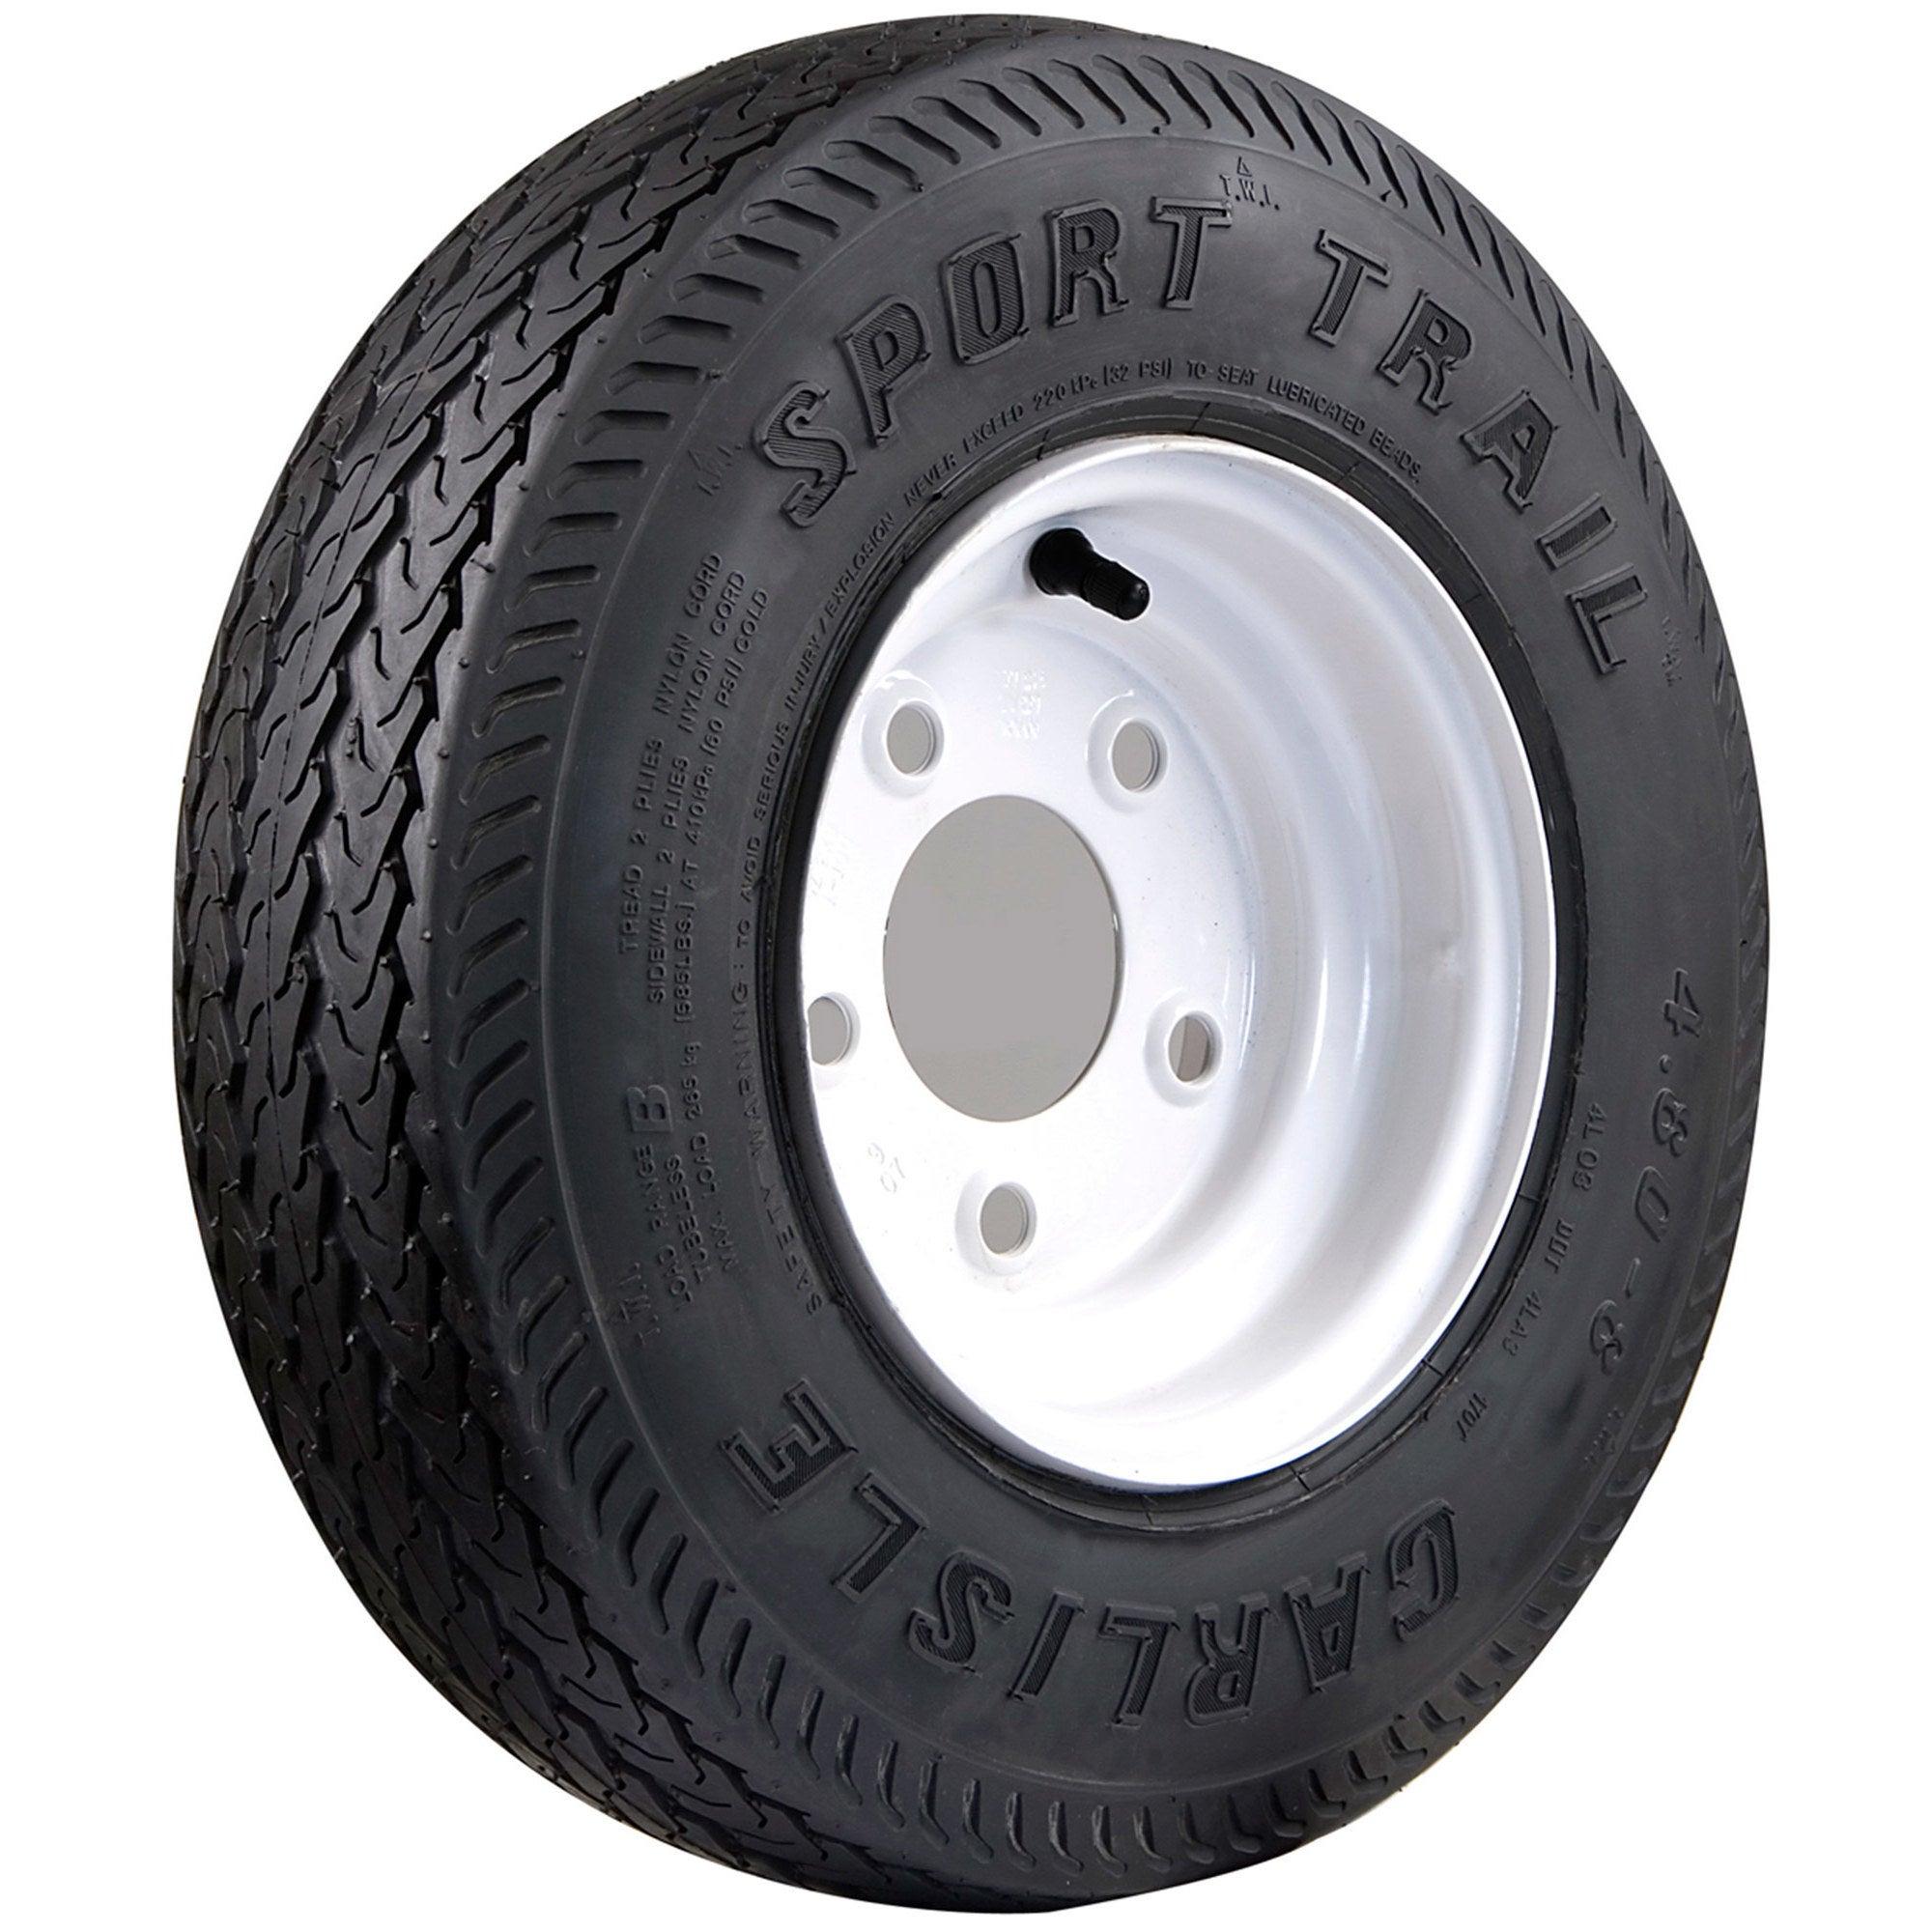 Carlisle Sport Trail Bias Trailer Tire - 20.5/8.0-10 LRF/...